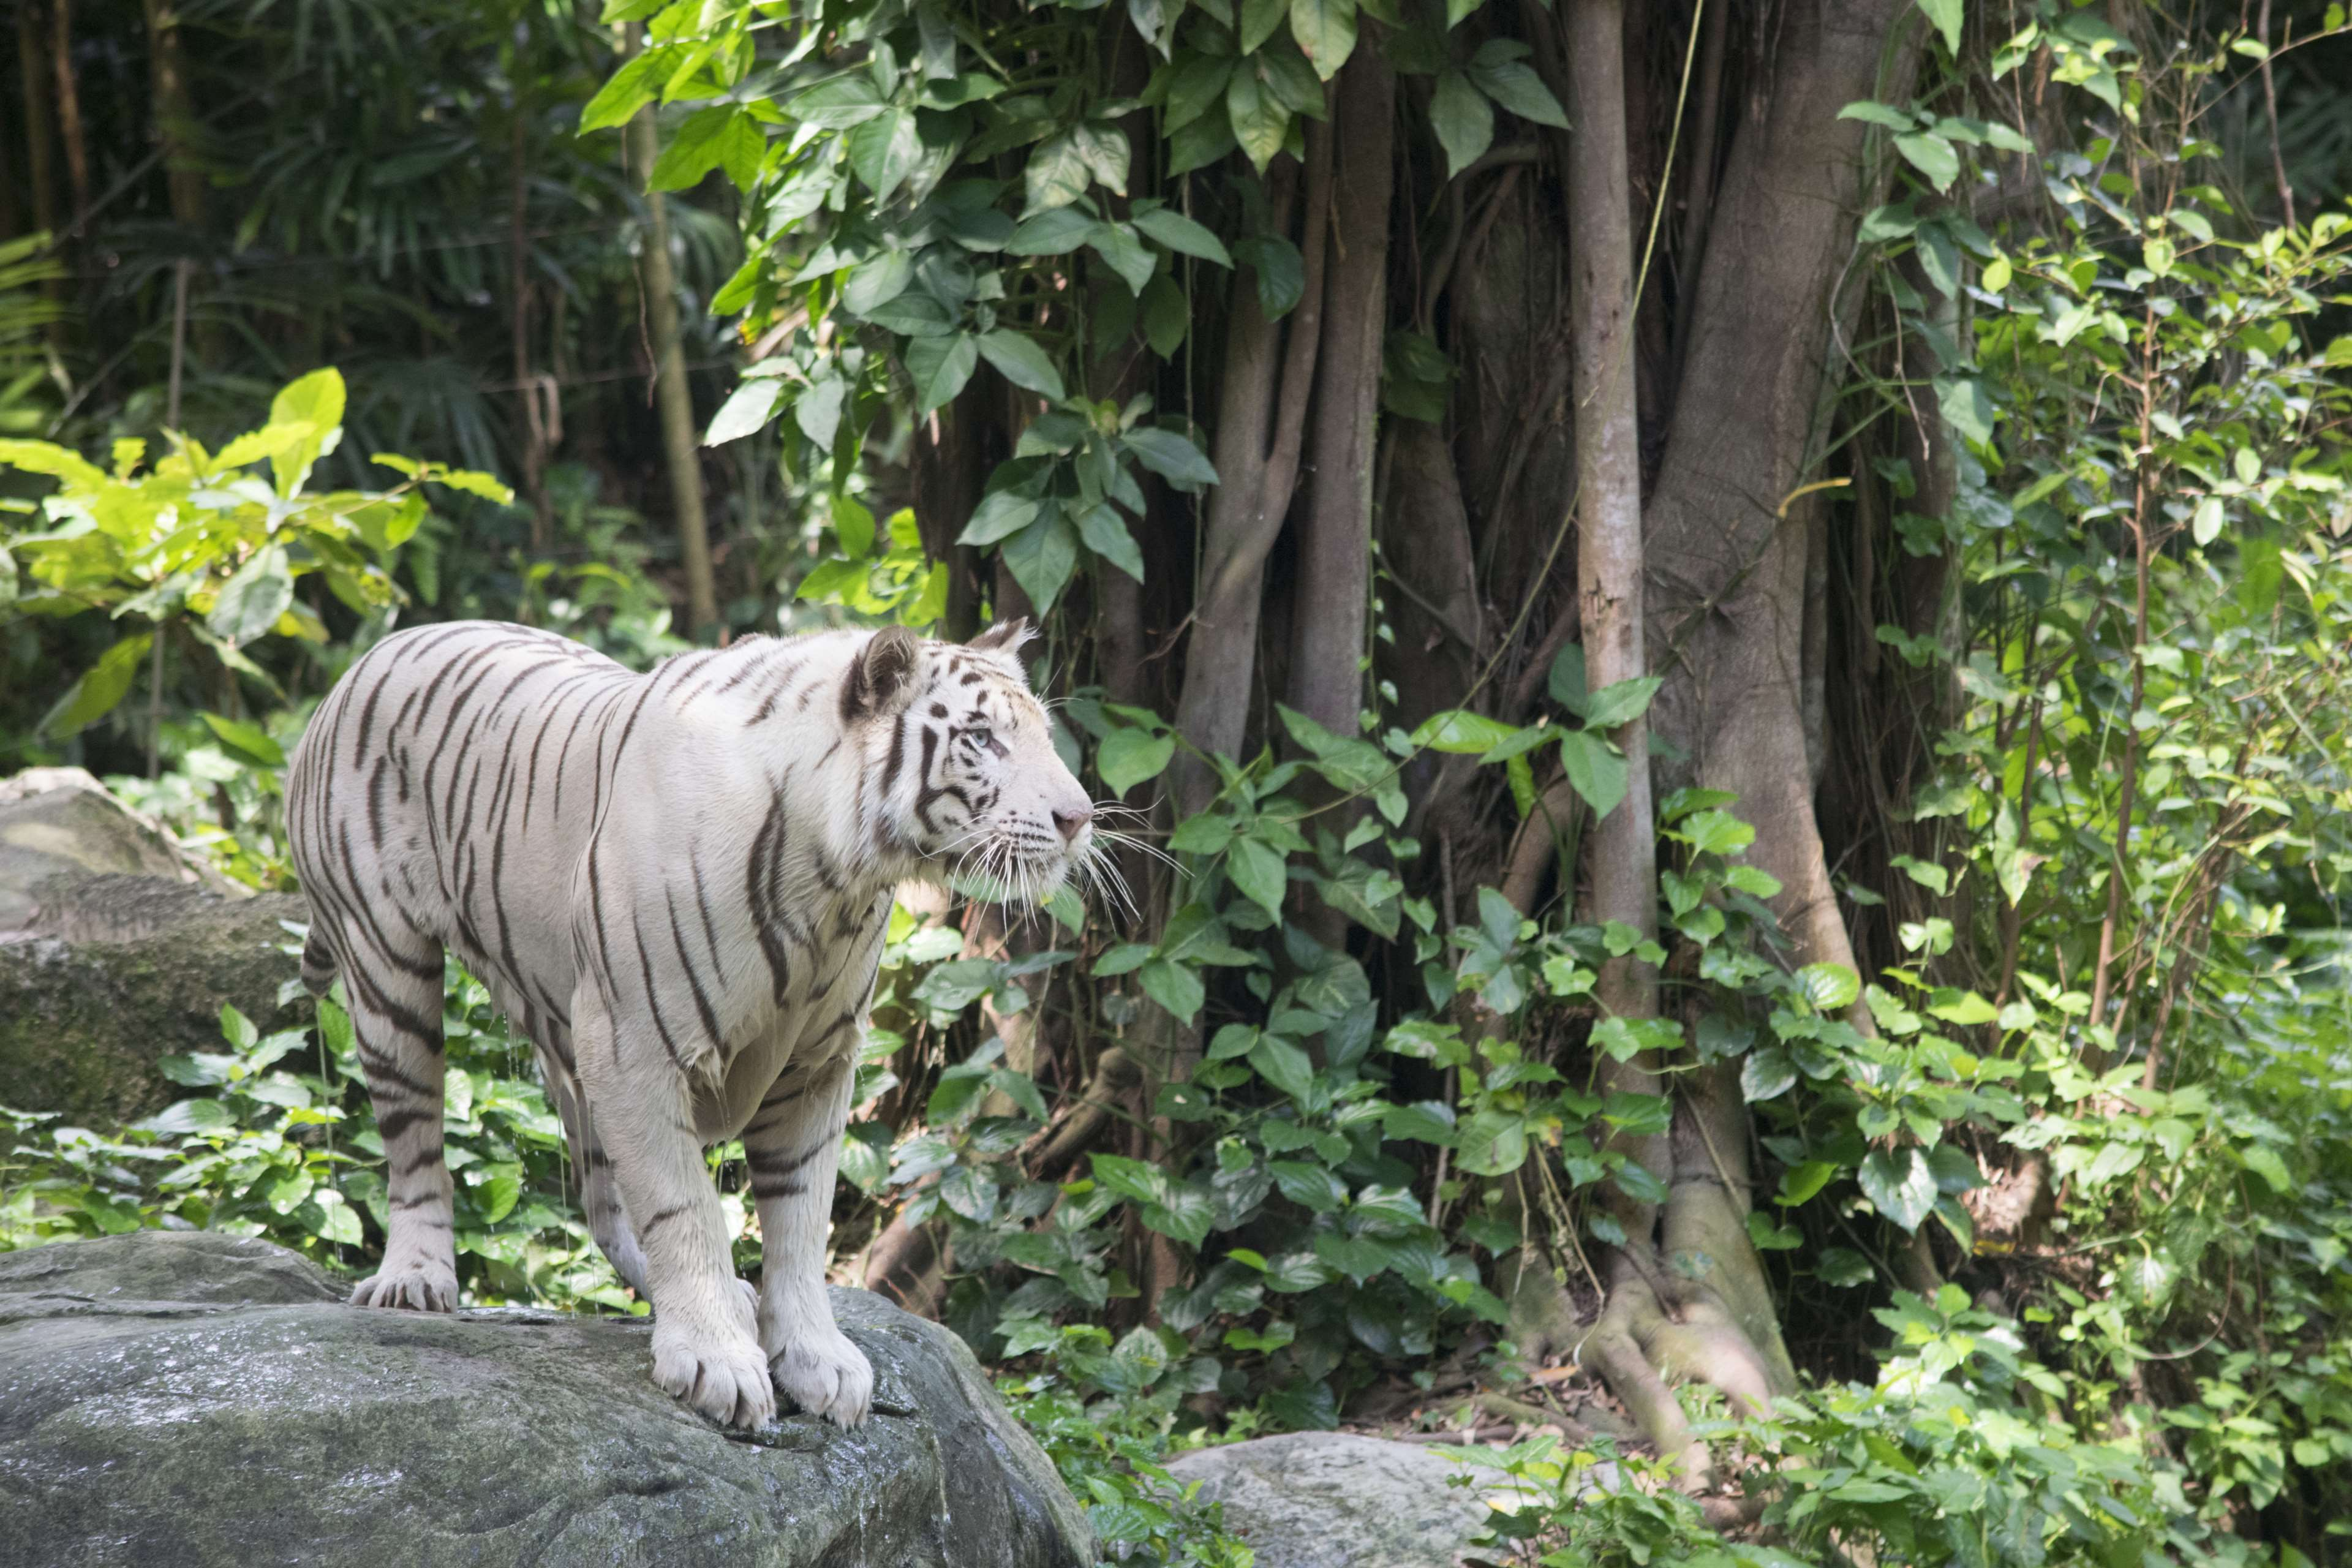 Animal, Big, Cat, Danger, Dangerous, Feline, Fur, Furry, - Hábitat Del Tigre De Bengala Blanco , HD Wallpaper & Backgrounds